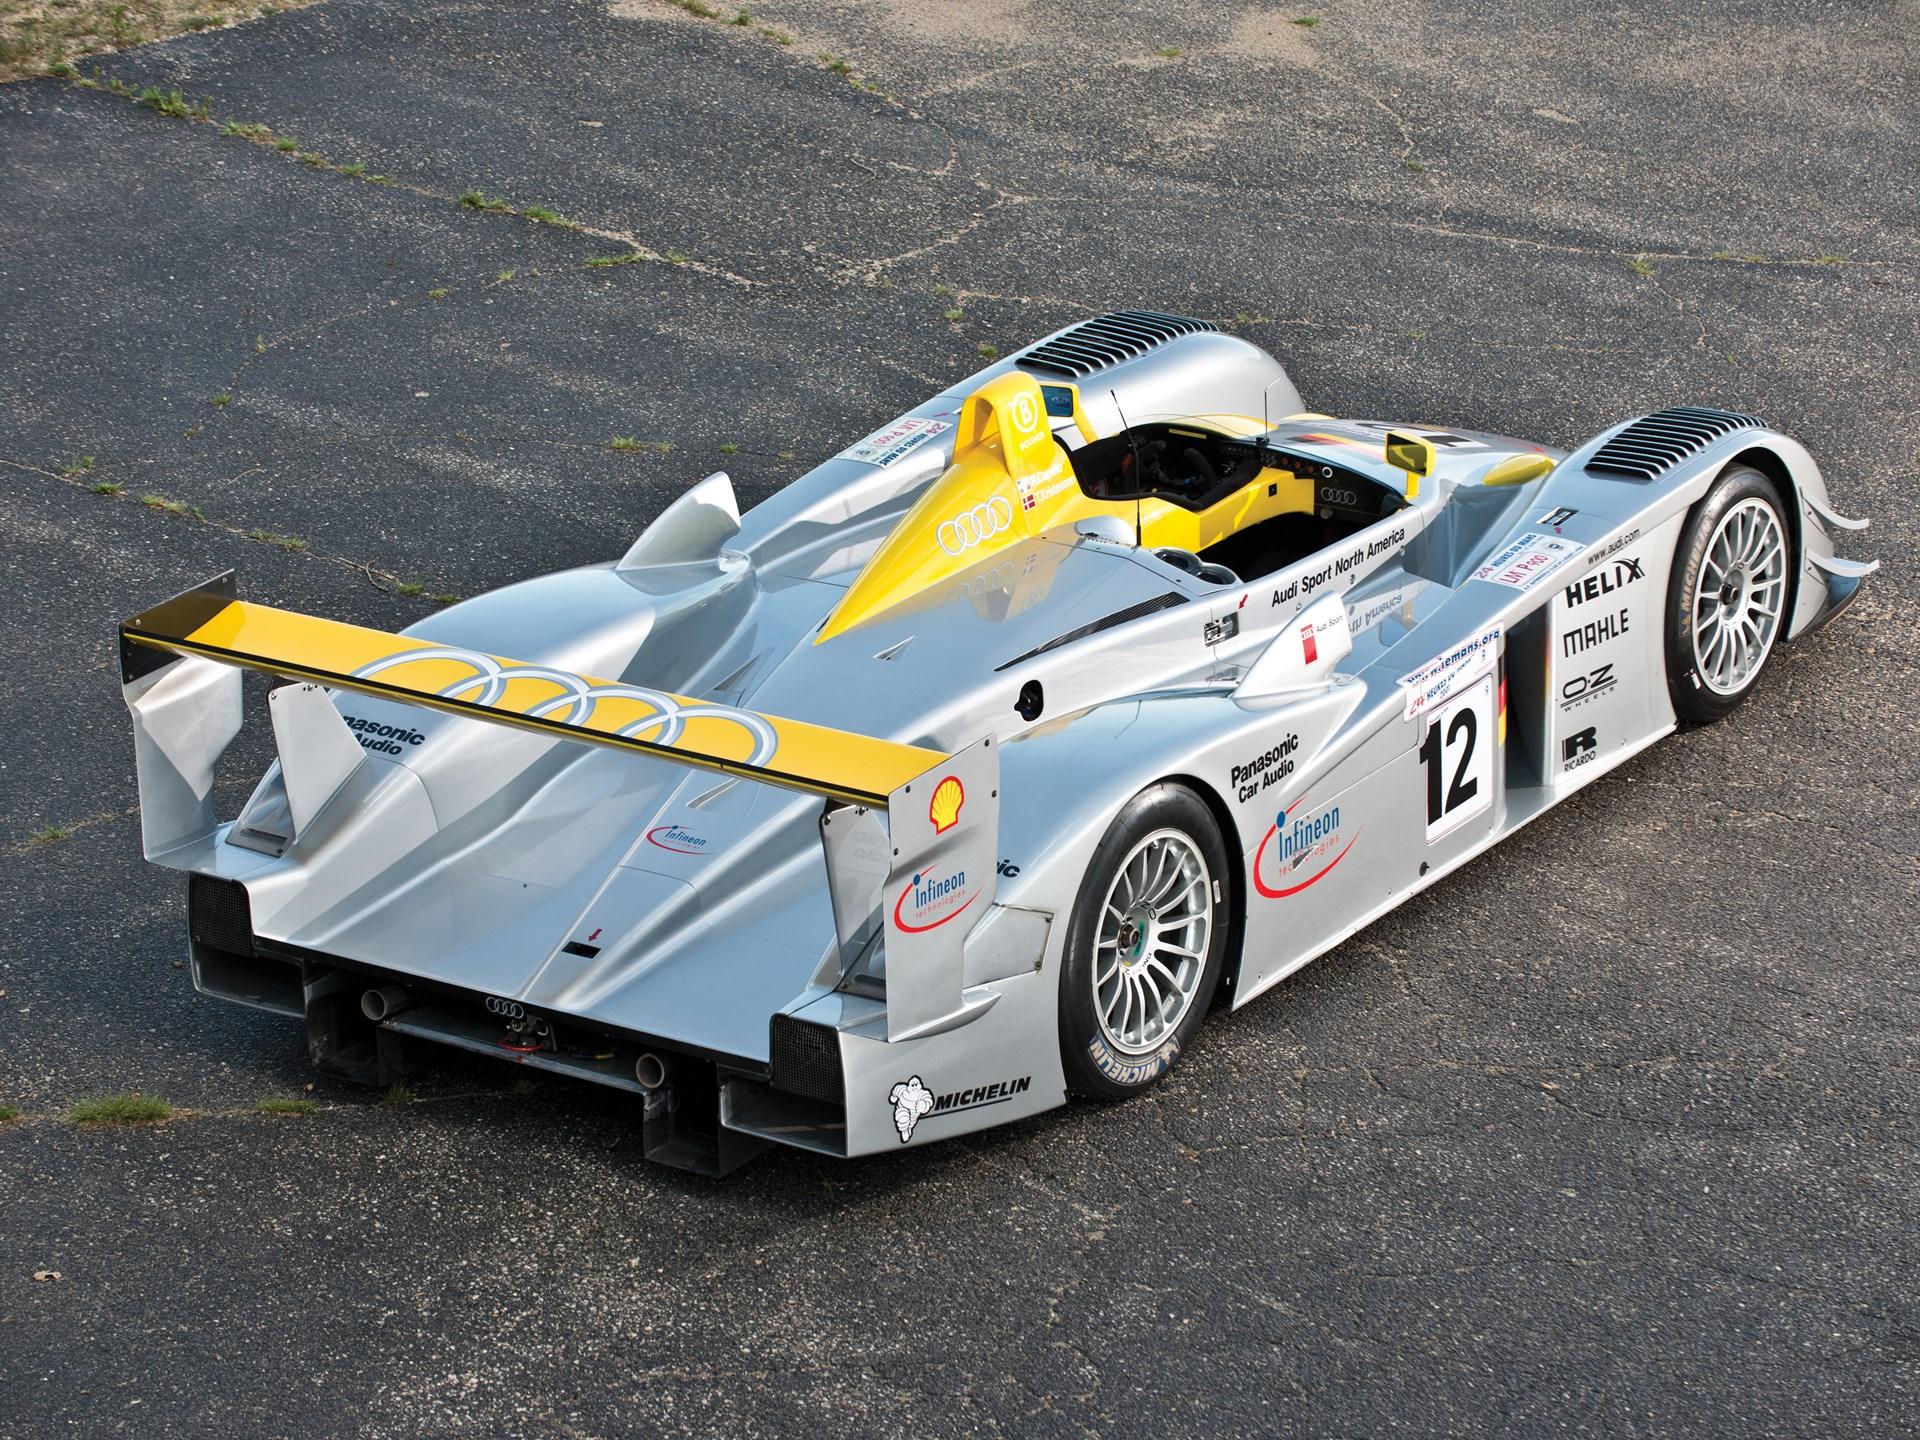 rm sotheby 39 s 2001 audi r8 le mans prototype racing car. Black Bedroom Furniture Sets. Home Design Ideas